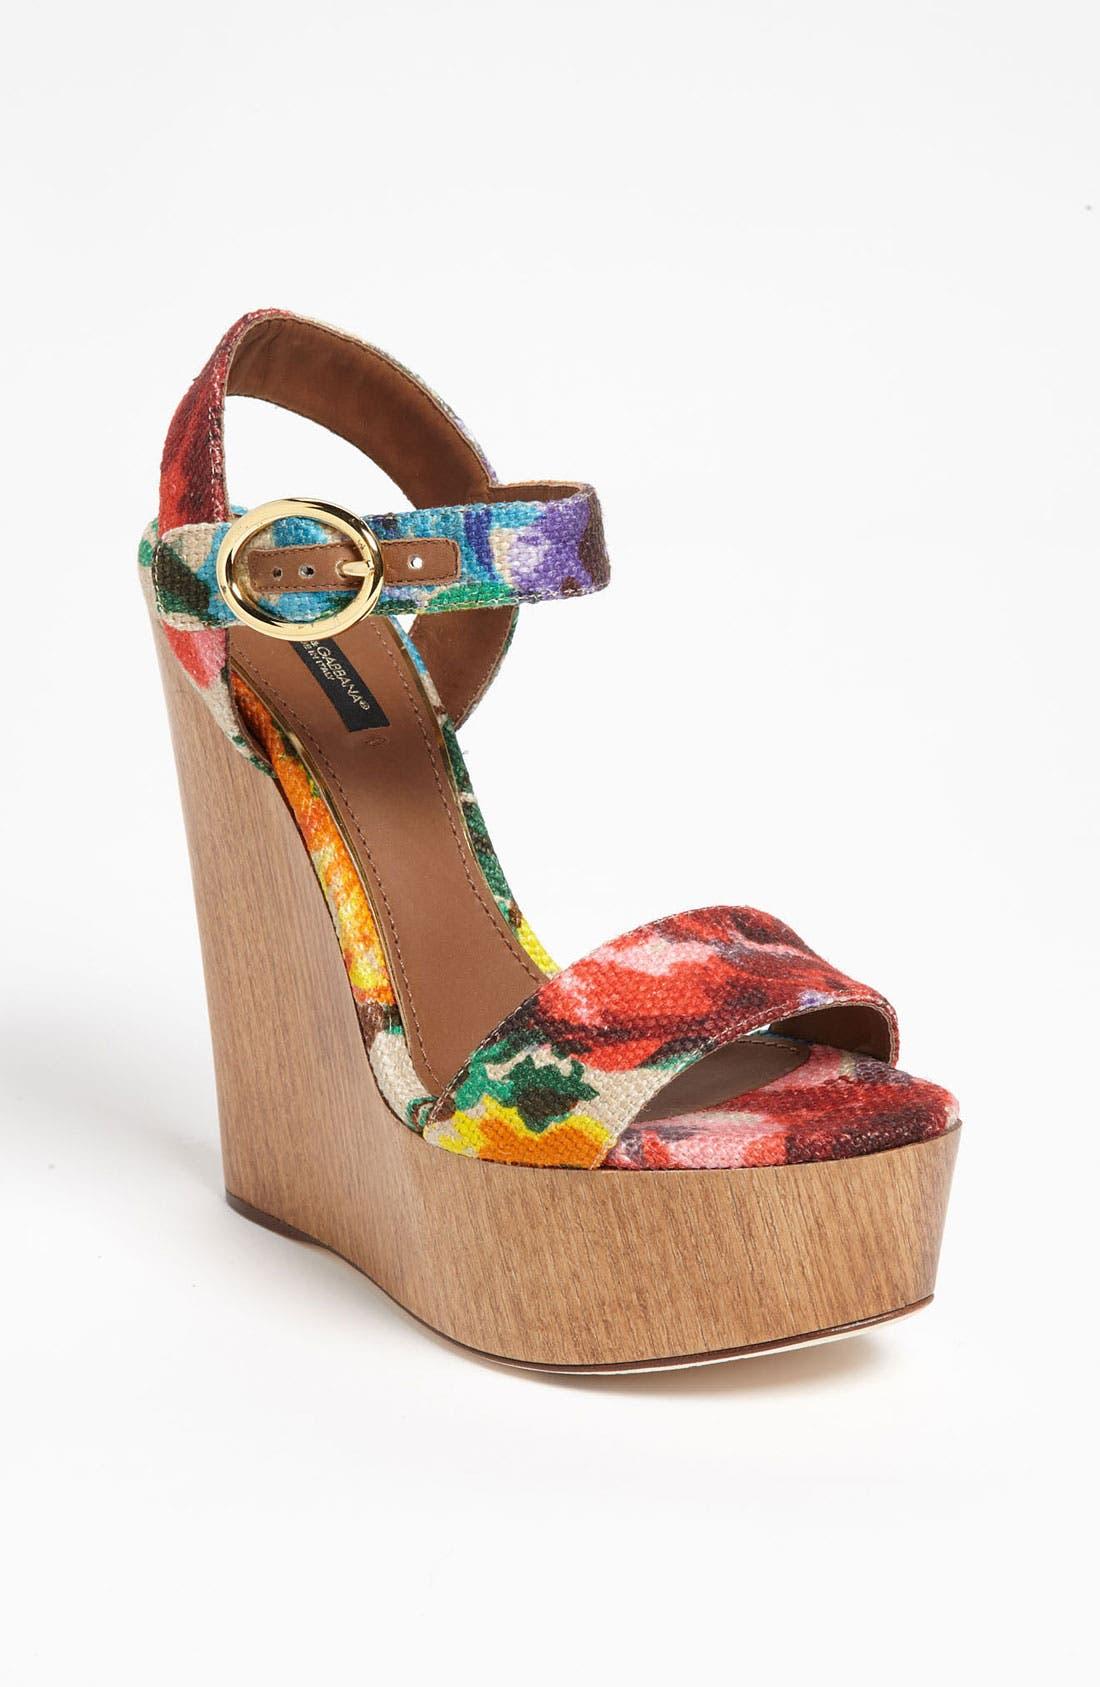 Main Image - Dolce&Gabbana Floral Sandal